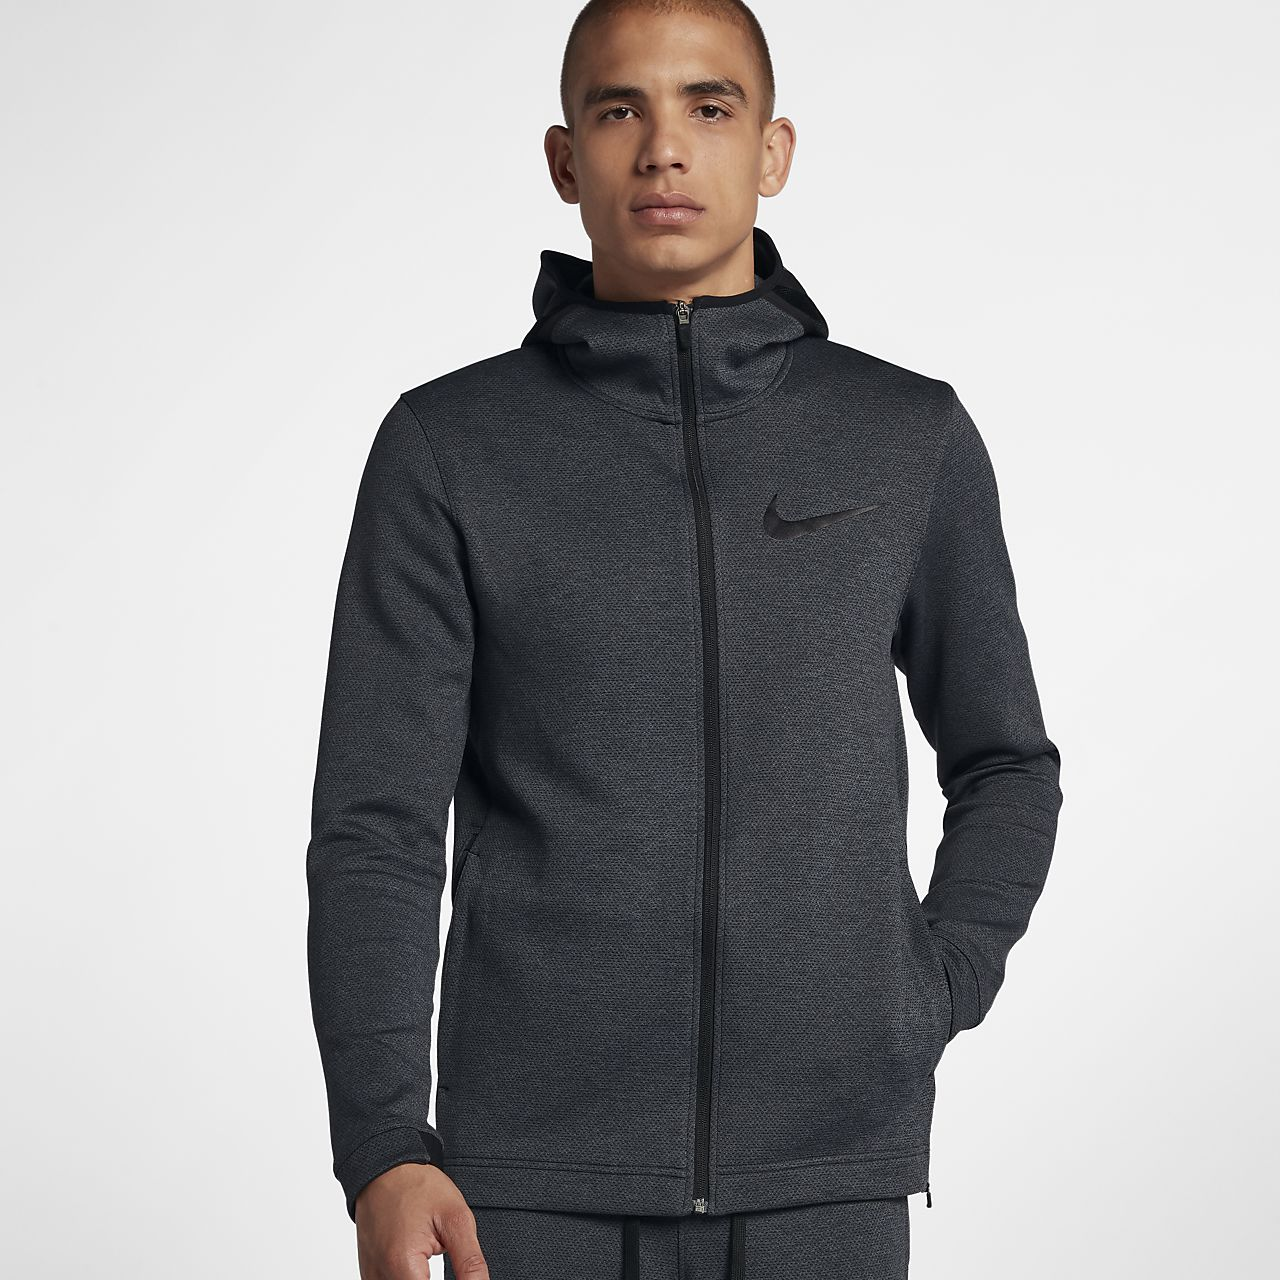 e4292895c Nike Therma Flex Showtime Men's Full-Zip Basketball Hoodie. Nike.com